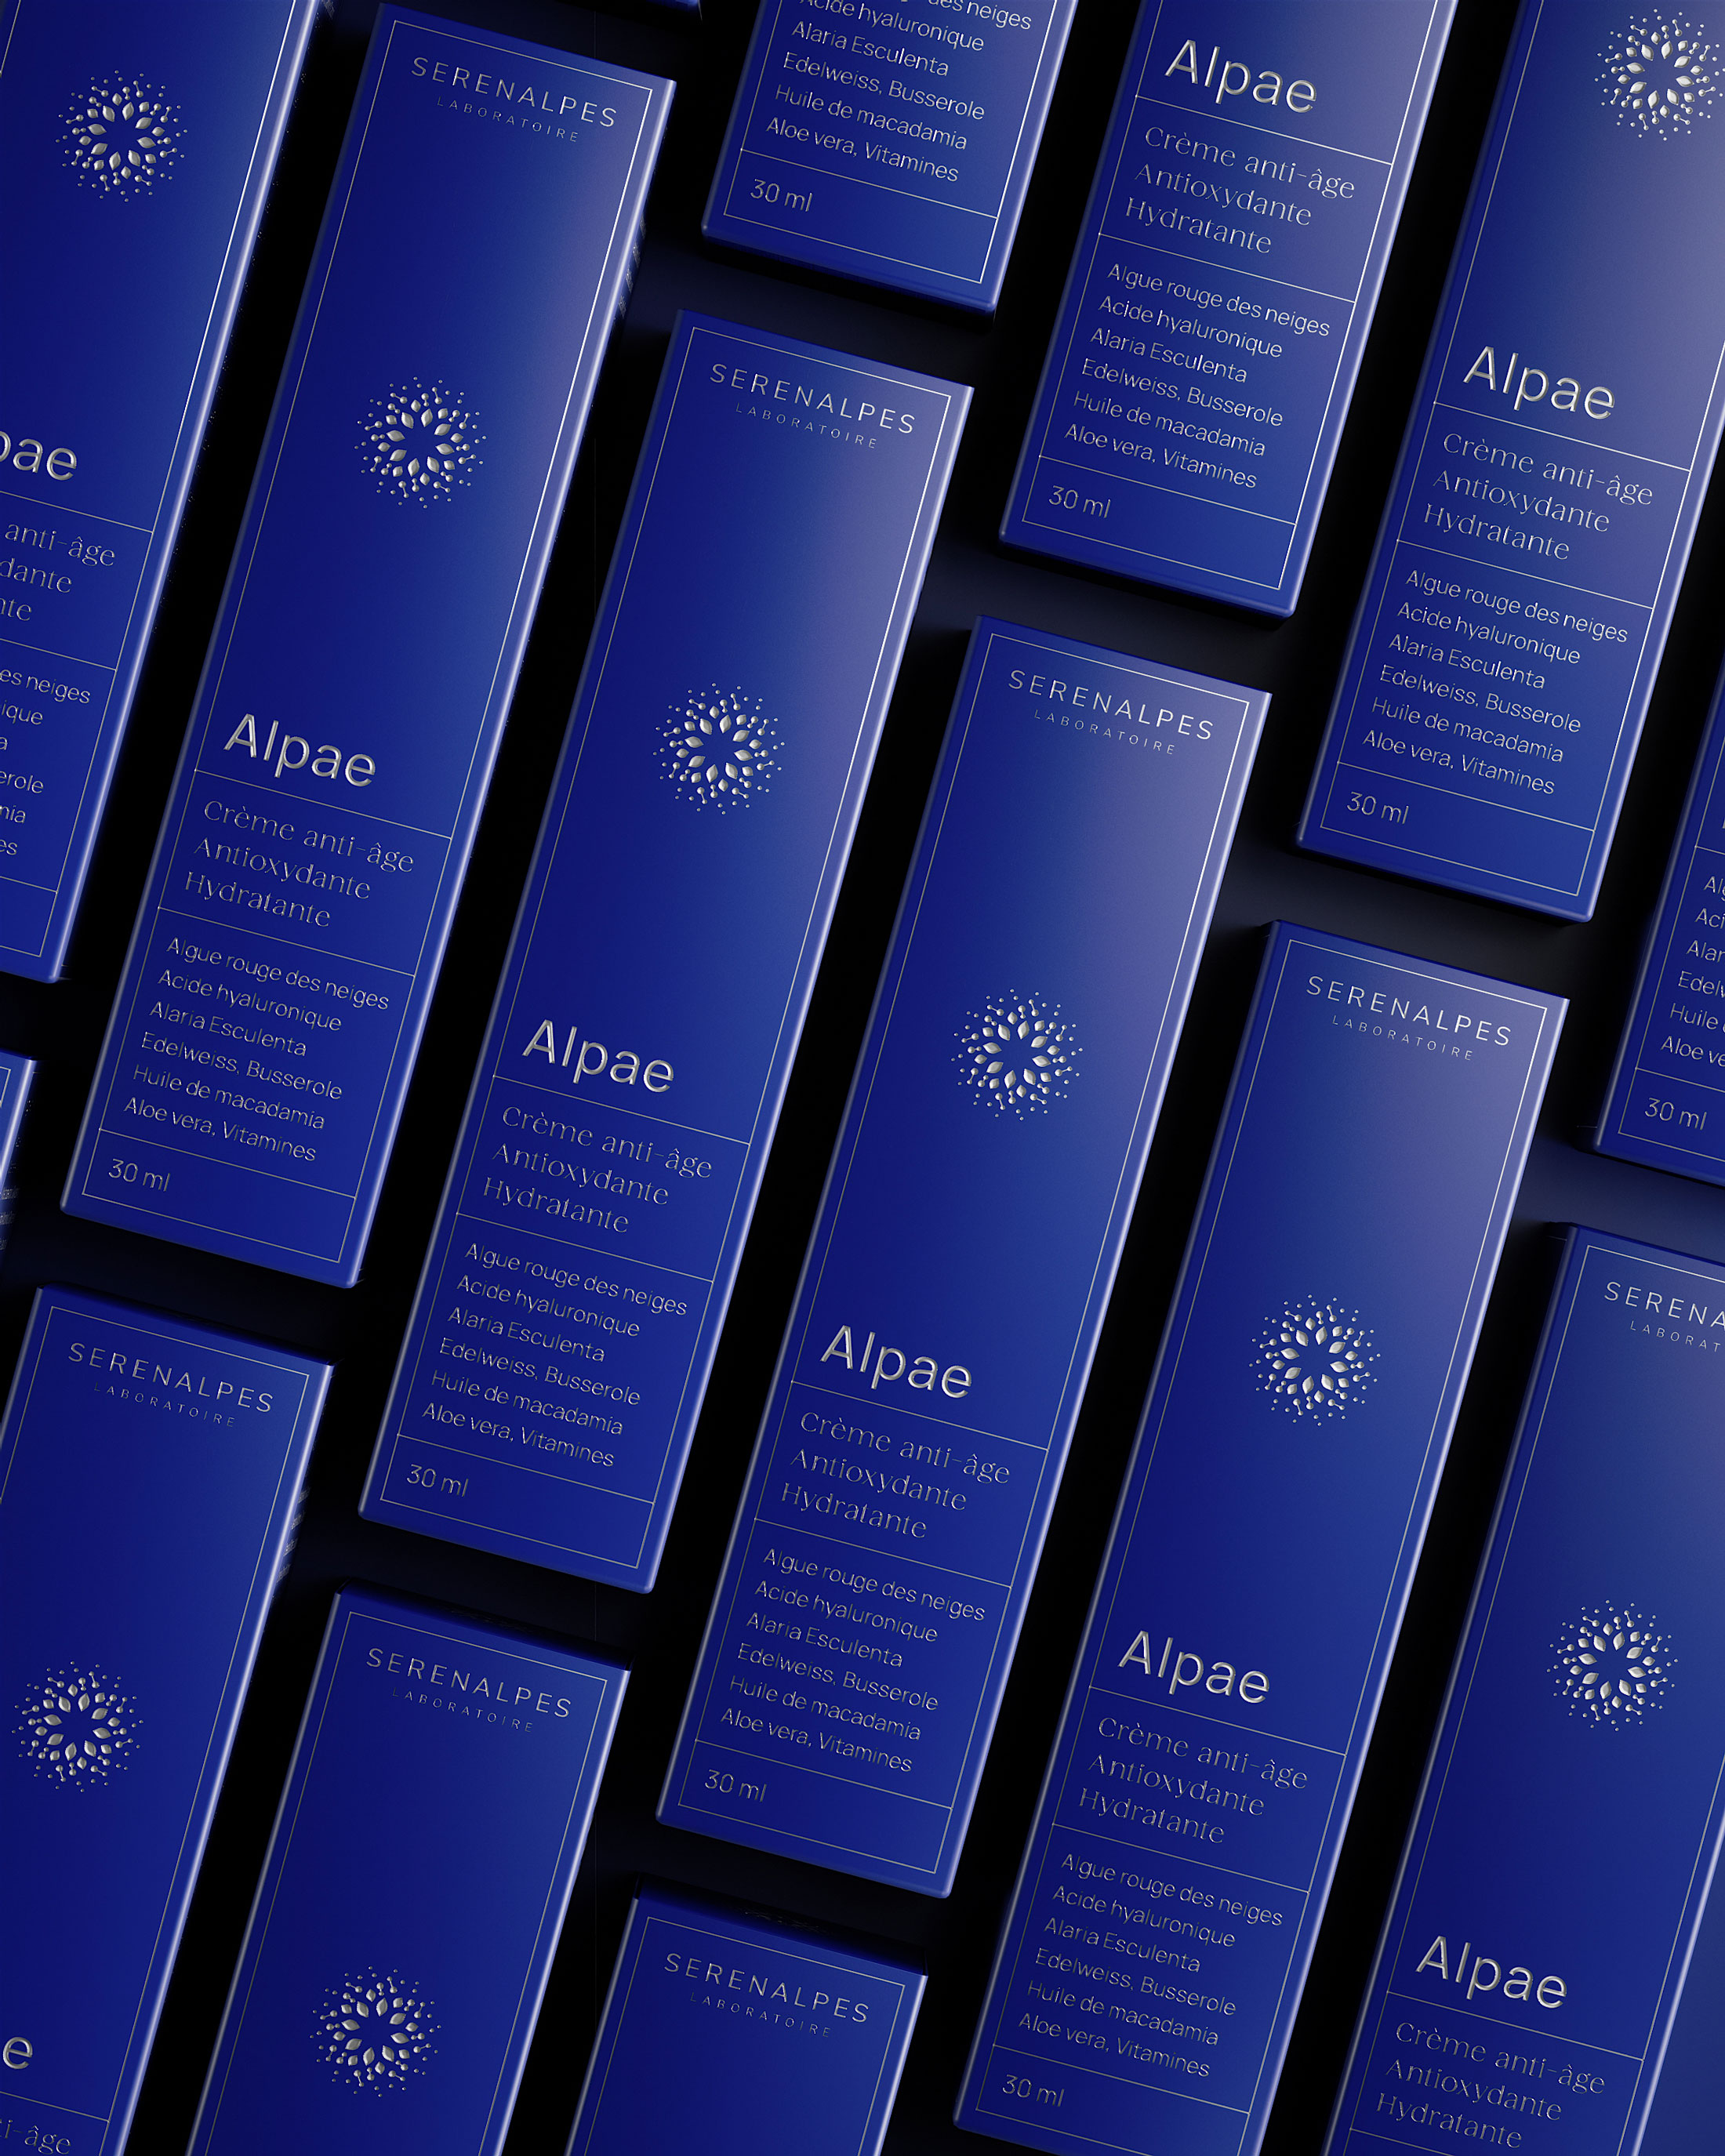 Packaging Design for Alpae Anti-Aging Cream Created by Petitmoulin Studio